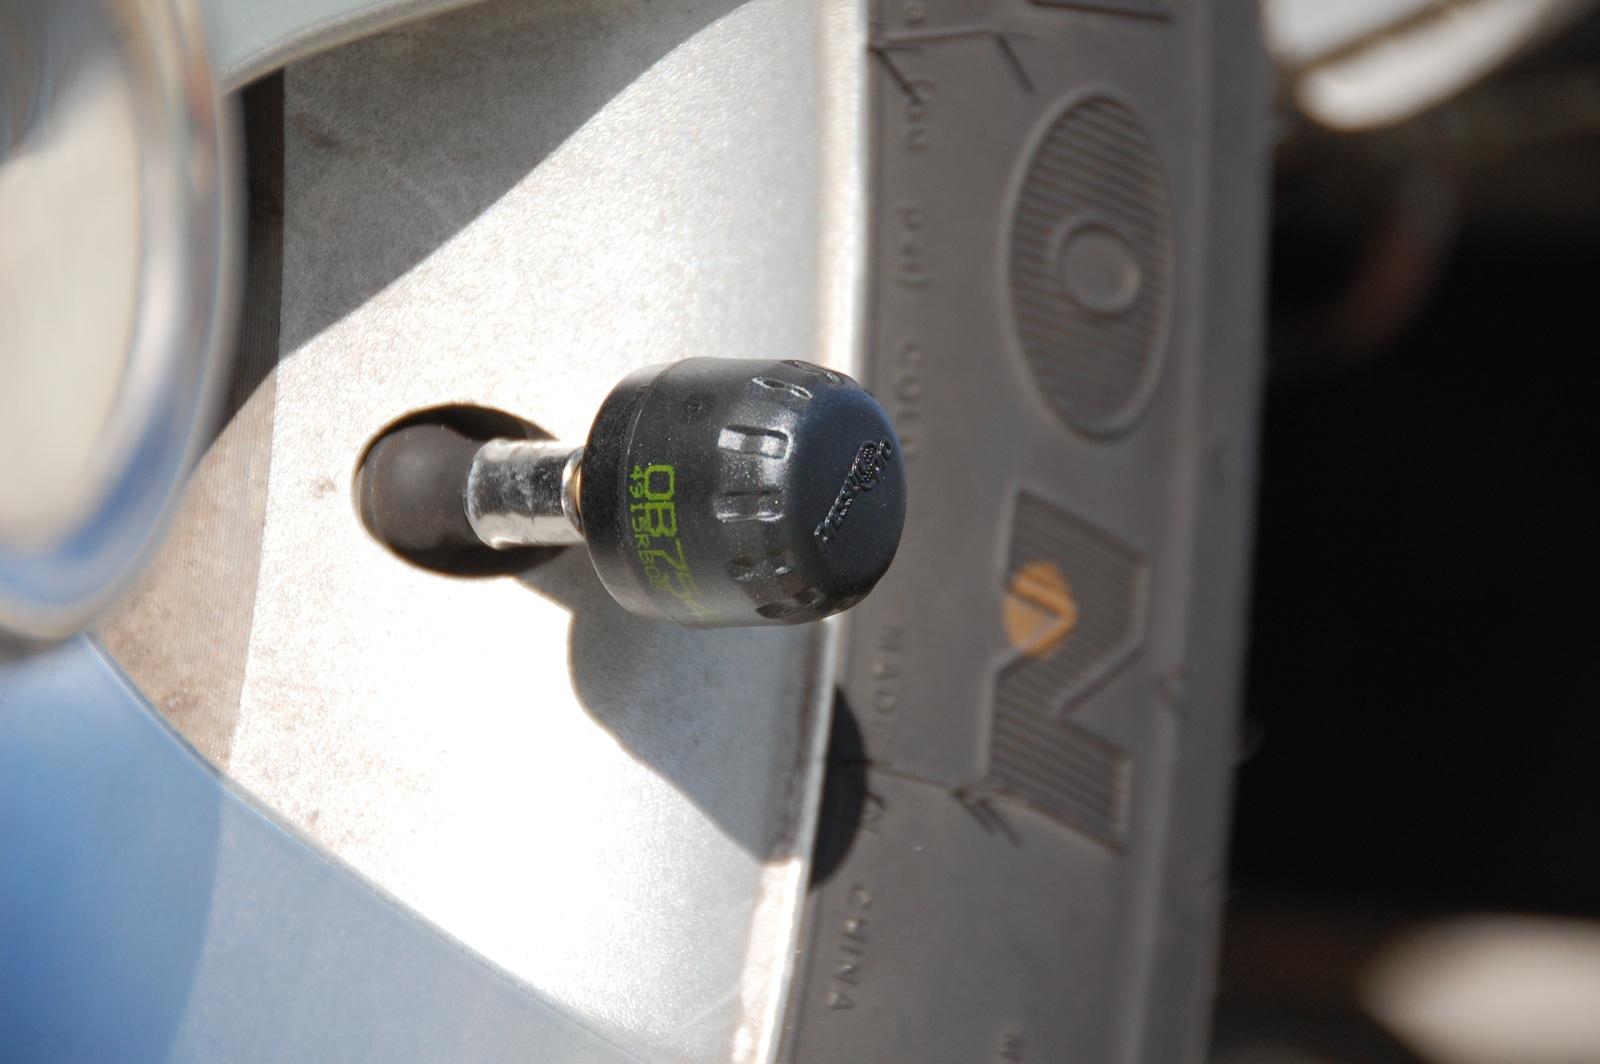 Click image for larger version  Name:DSC_0010 PressurePro sensor.jpg Views:66 Size:257.0 KB ID:256881